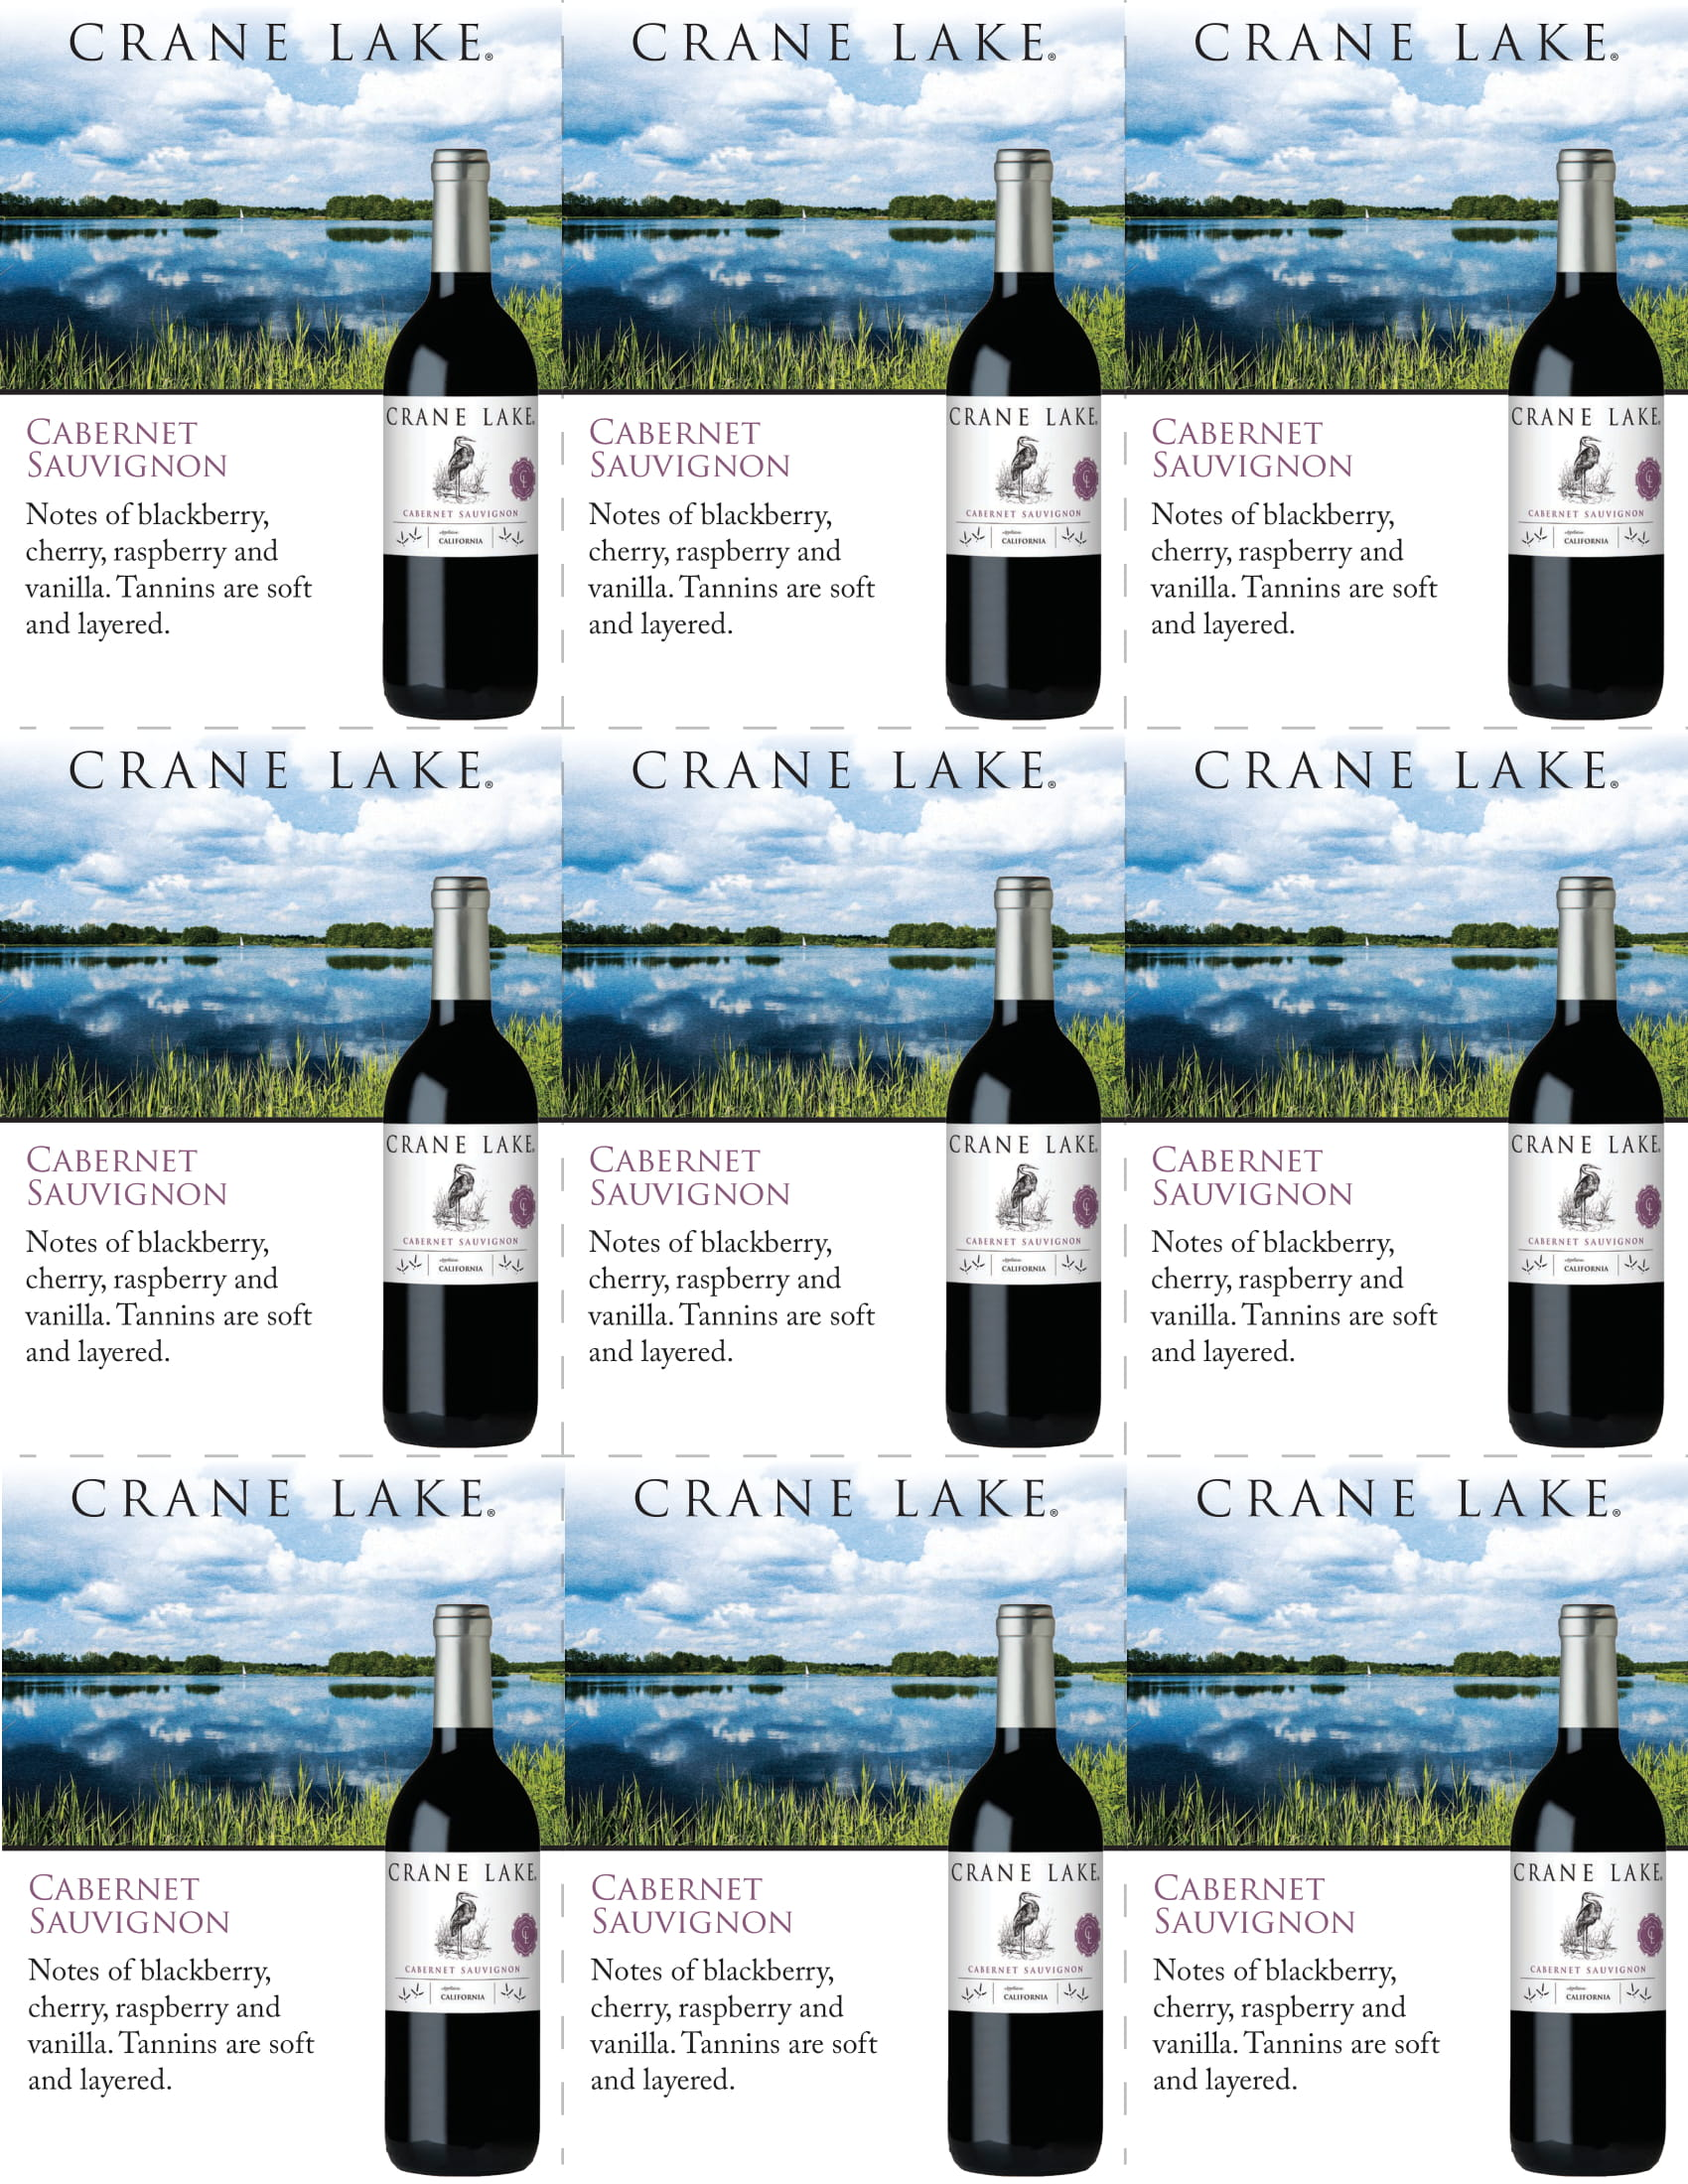 Crane Lake Cabernet Sauvignon Shelf Talkers